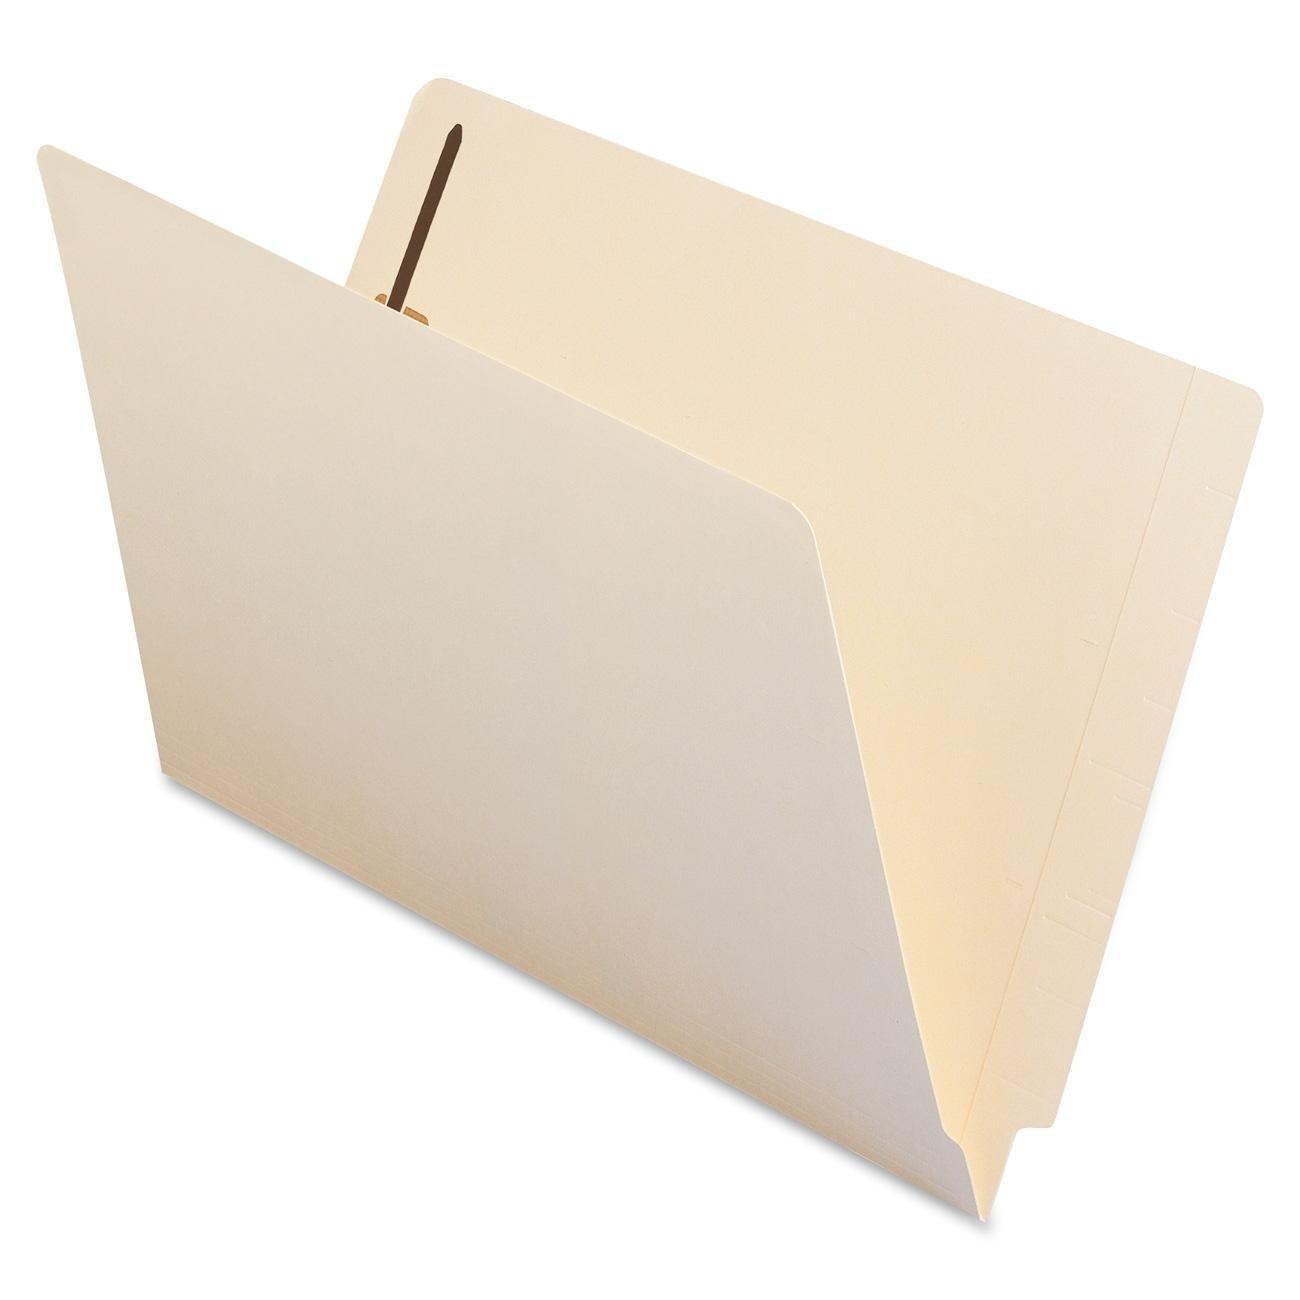 Smead End Tab Fastener File Folder, Shelf-Master Reinforced Straight-Cut Tab, 2 Fasteners, Legal Size, Manila, 50 per Box (37115)